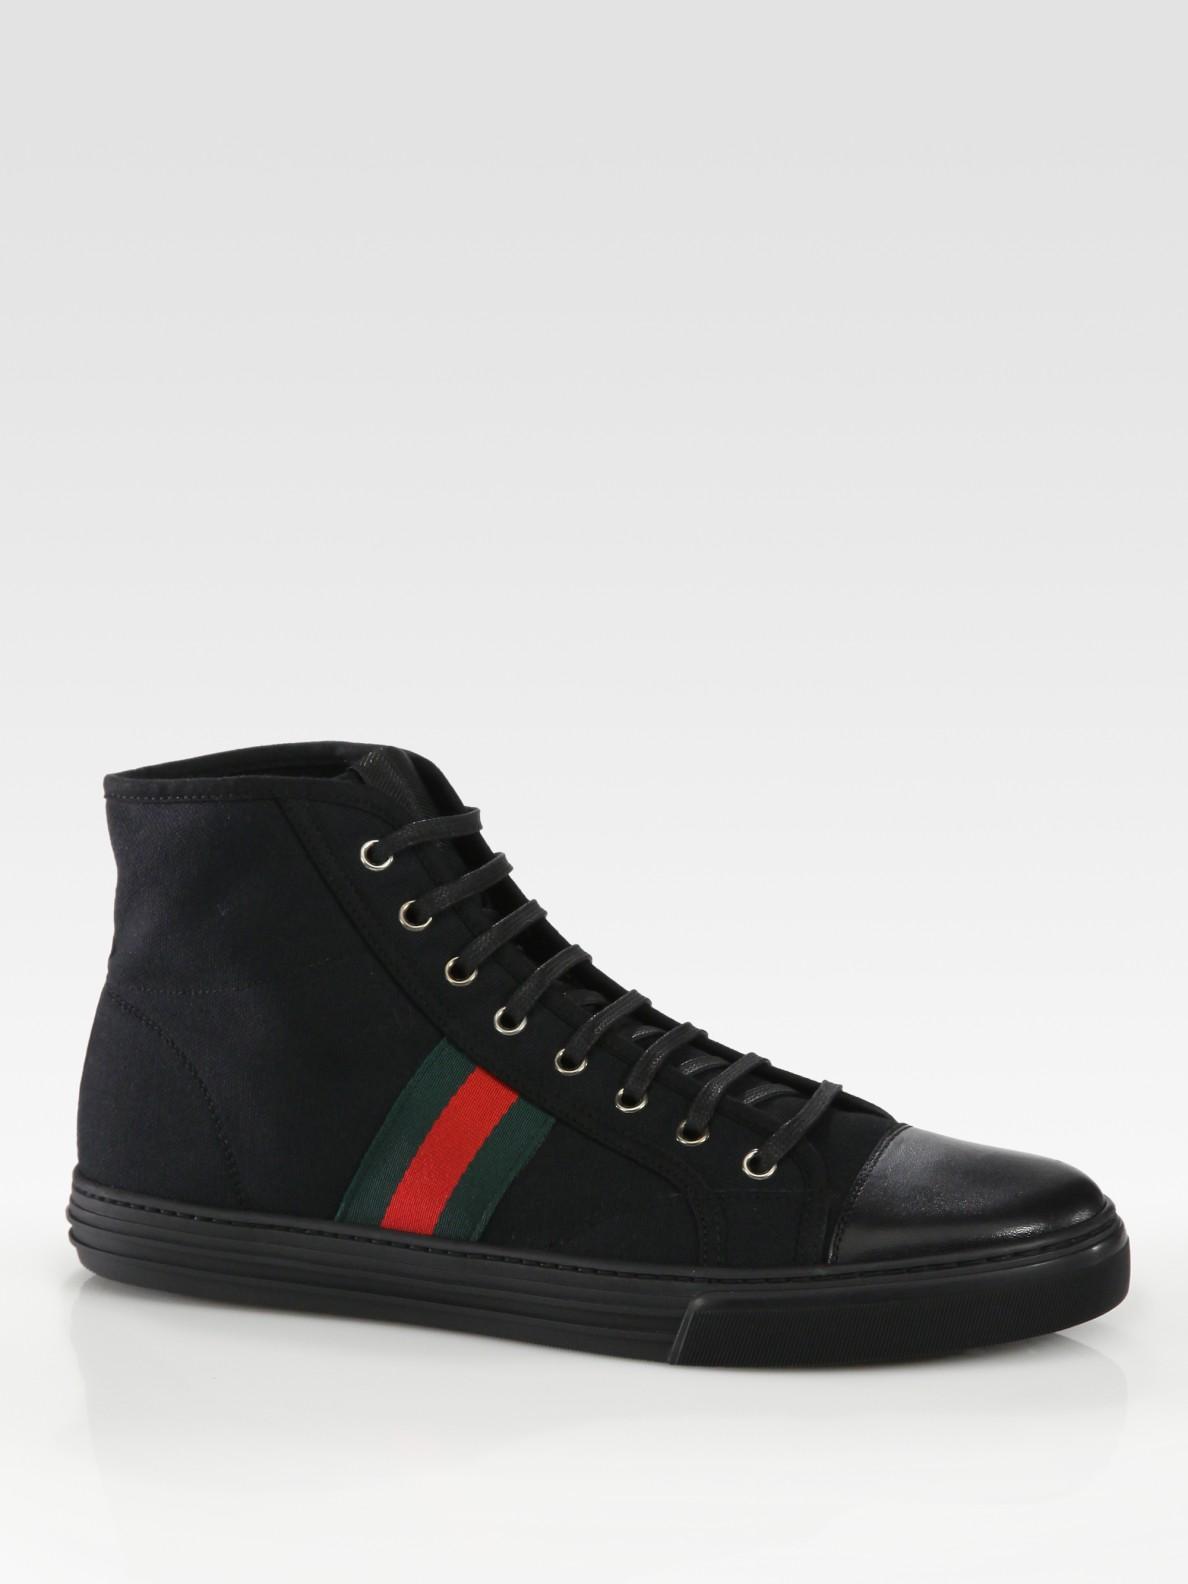 gucci high top sneaker in black for men lyst. Black Bedroom Furniture Sets. Home Design Ideas